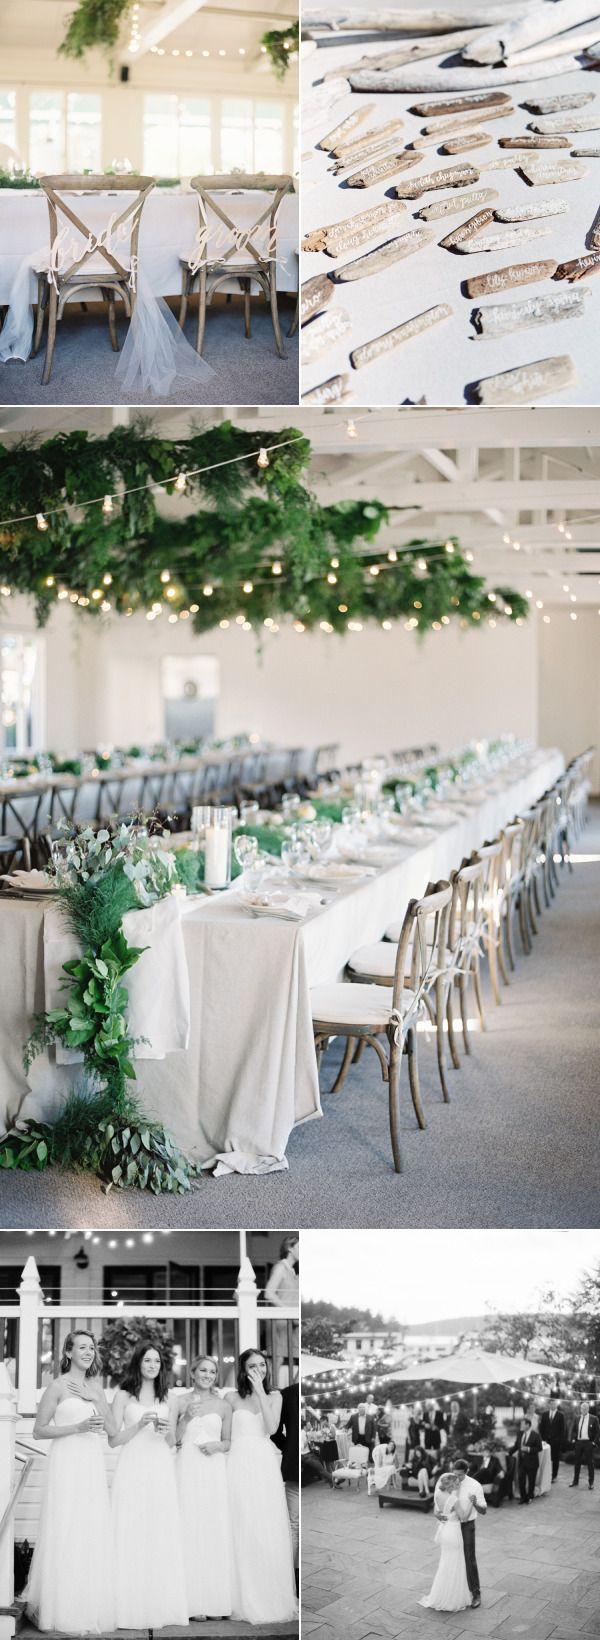 Elegant Coastal Chic Roche Harbor Wedding